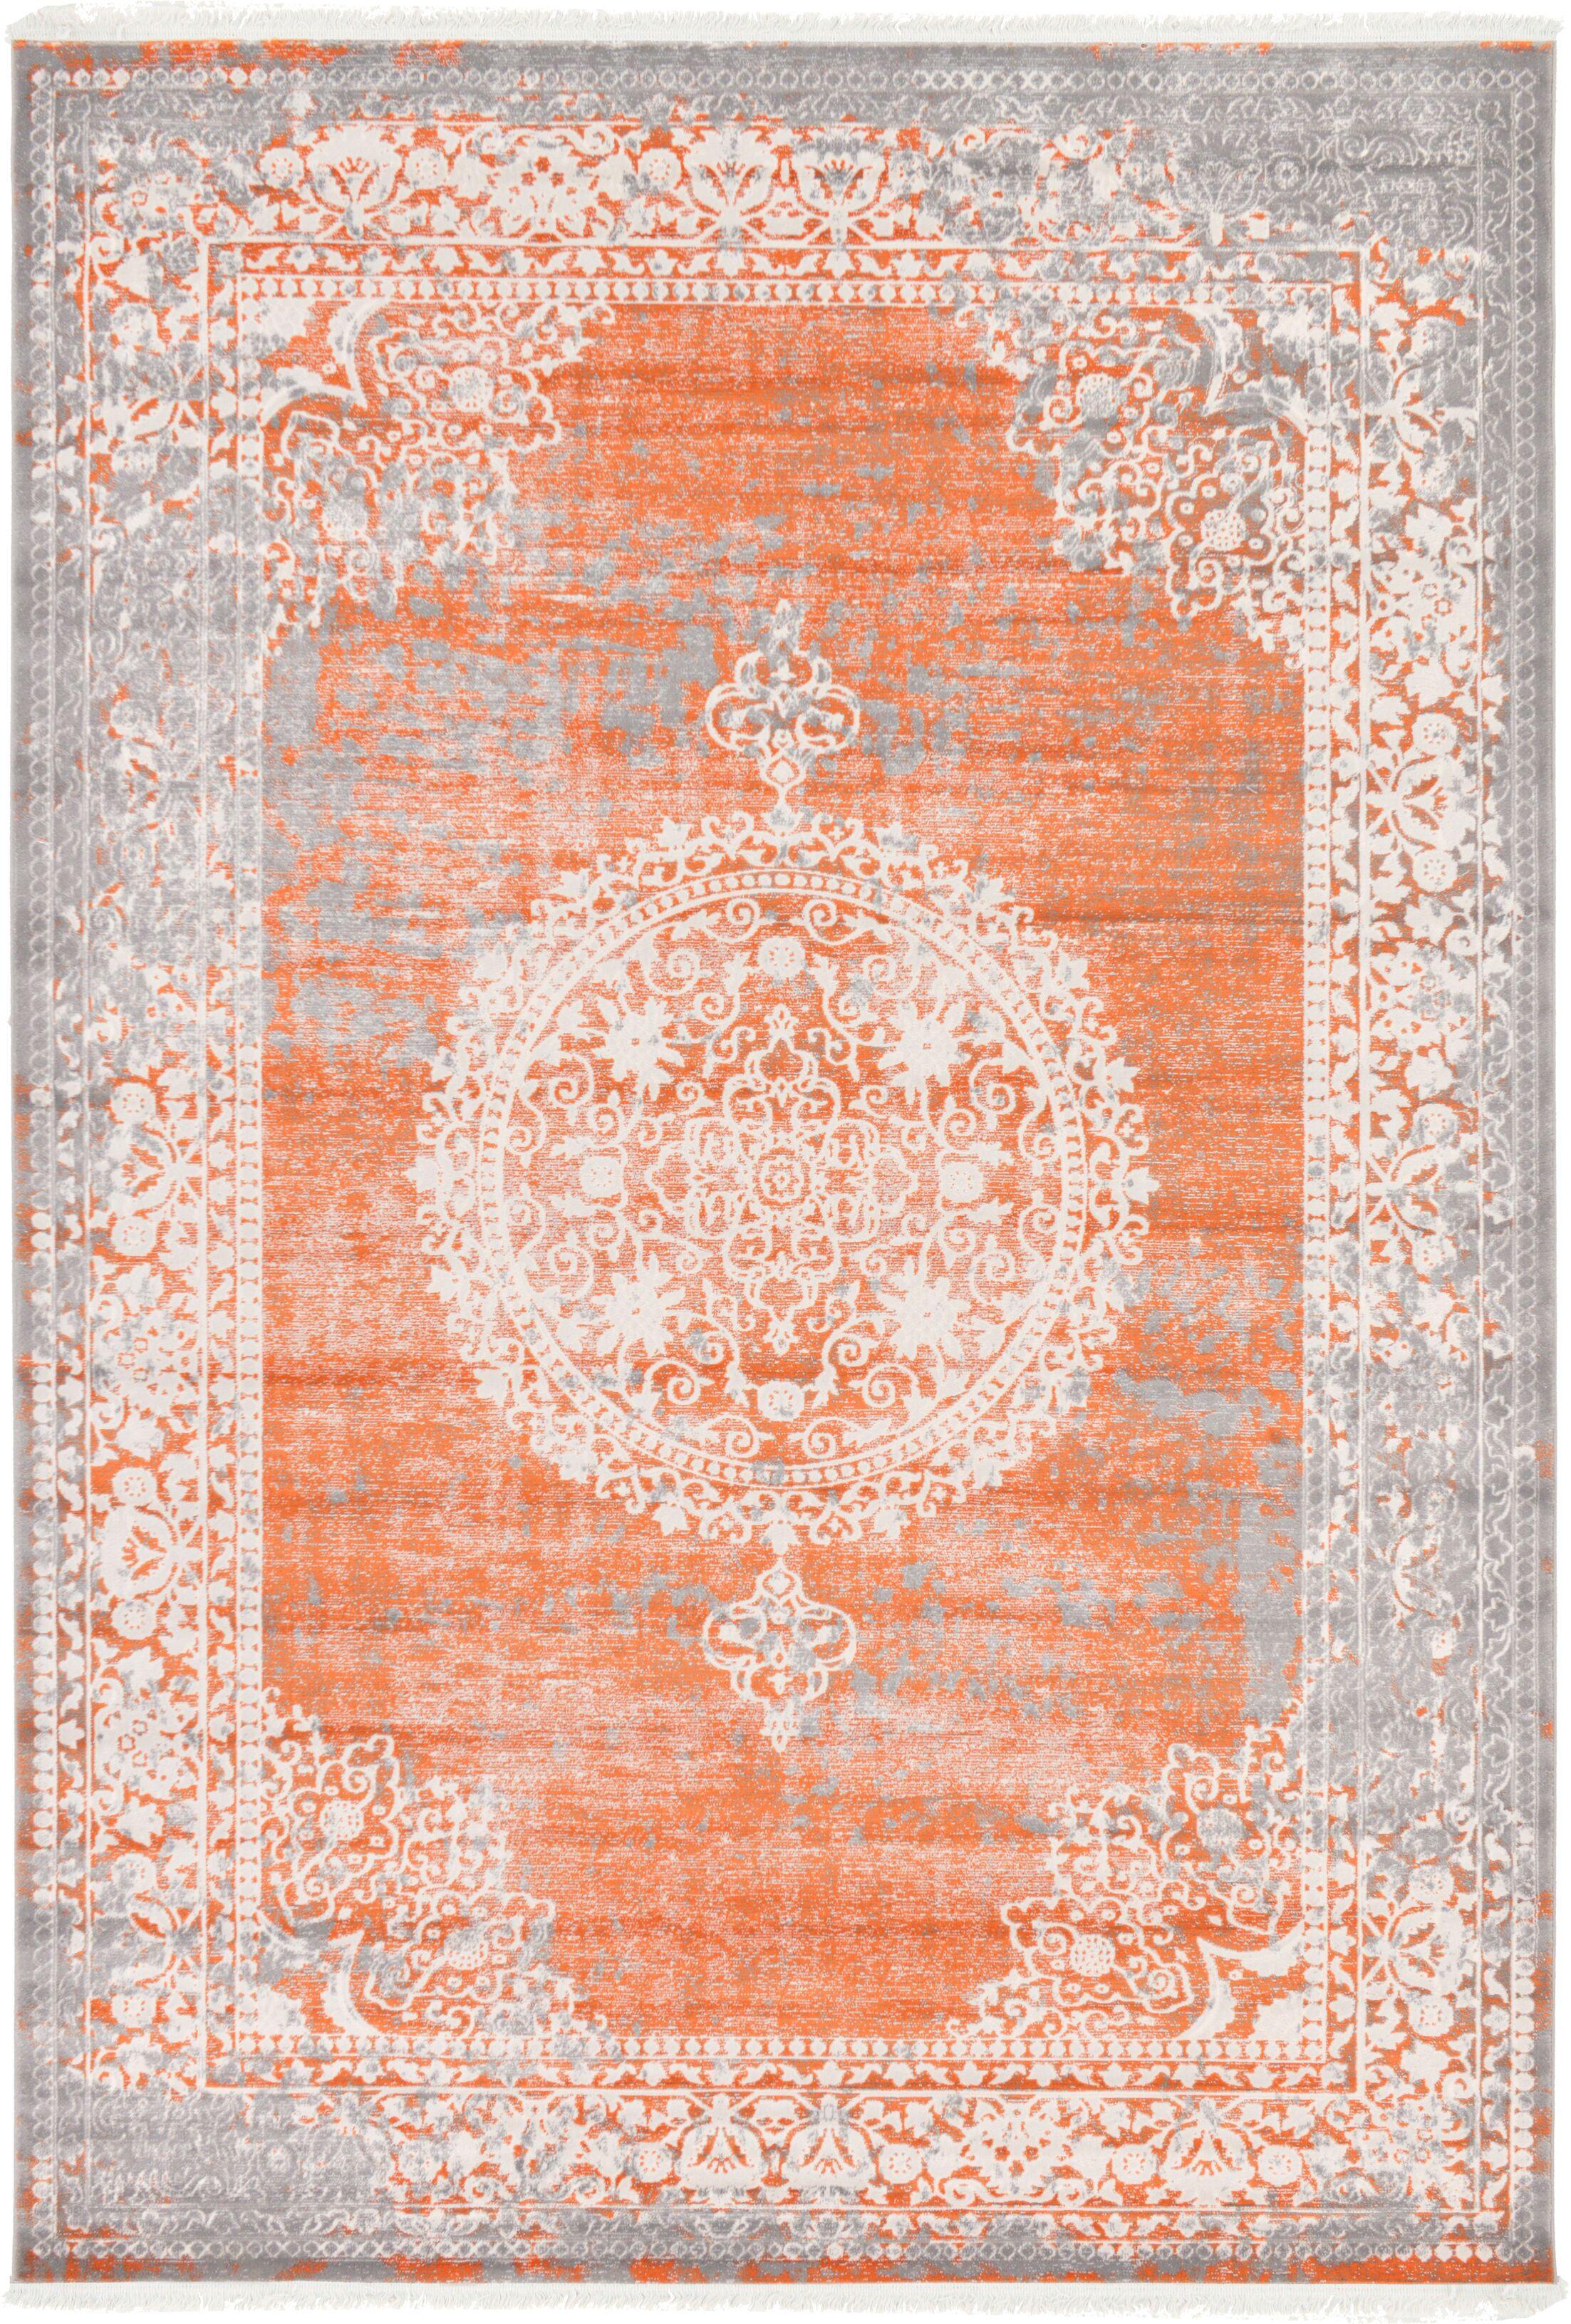 Colebrook Orange Area Rug Rug Size: Rectangle 7' x 10'